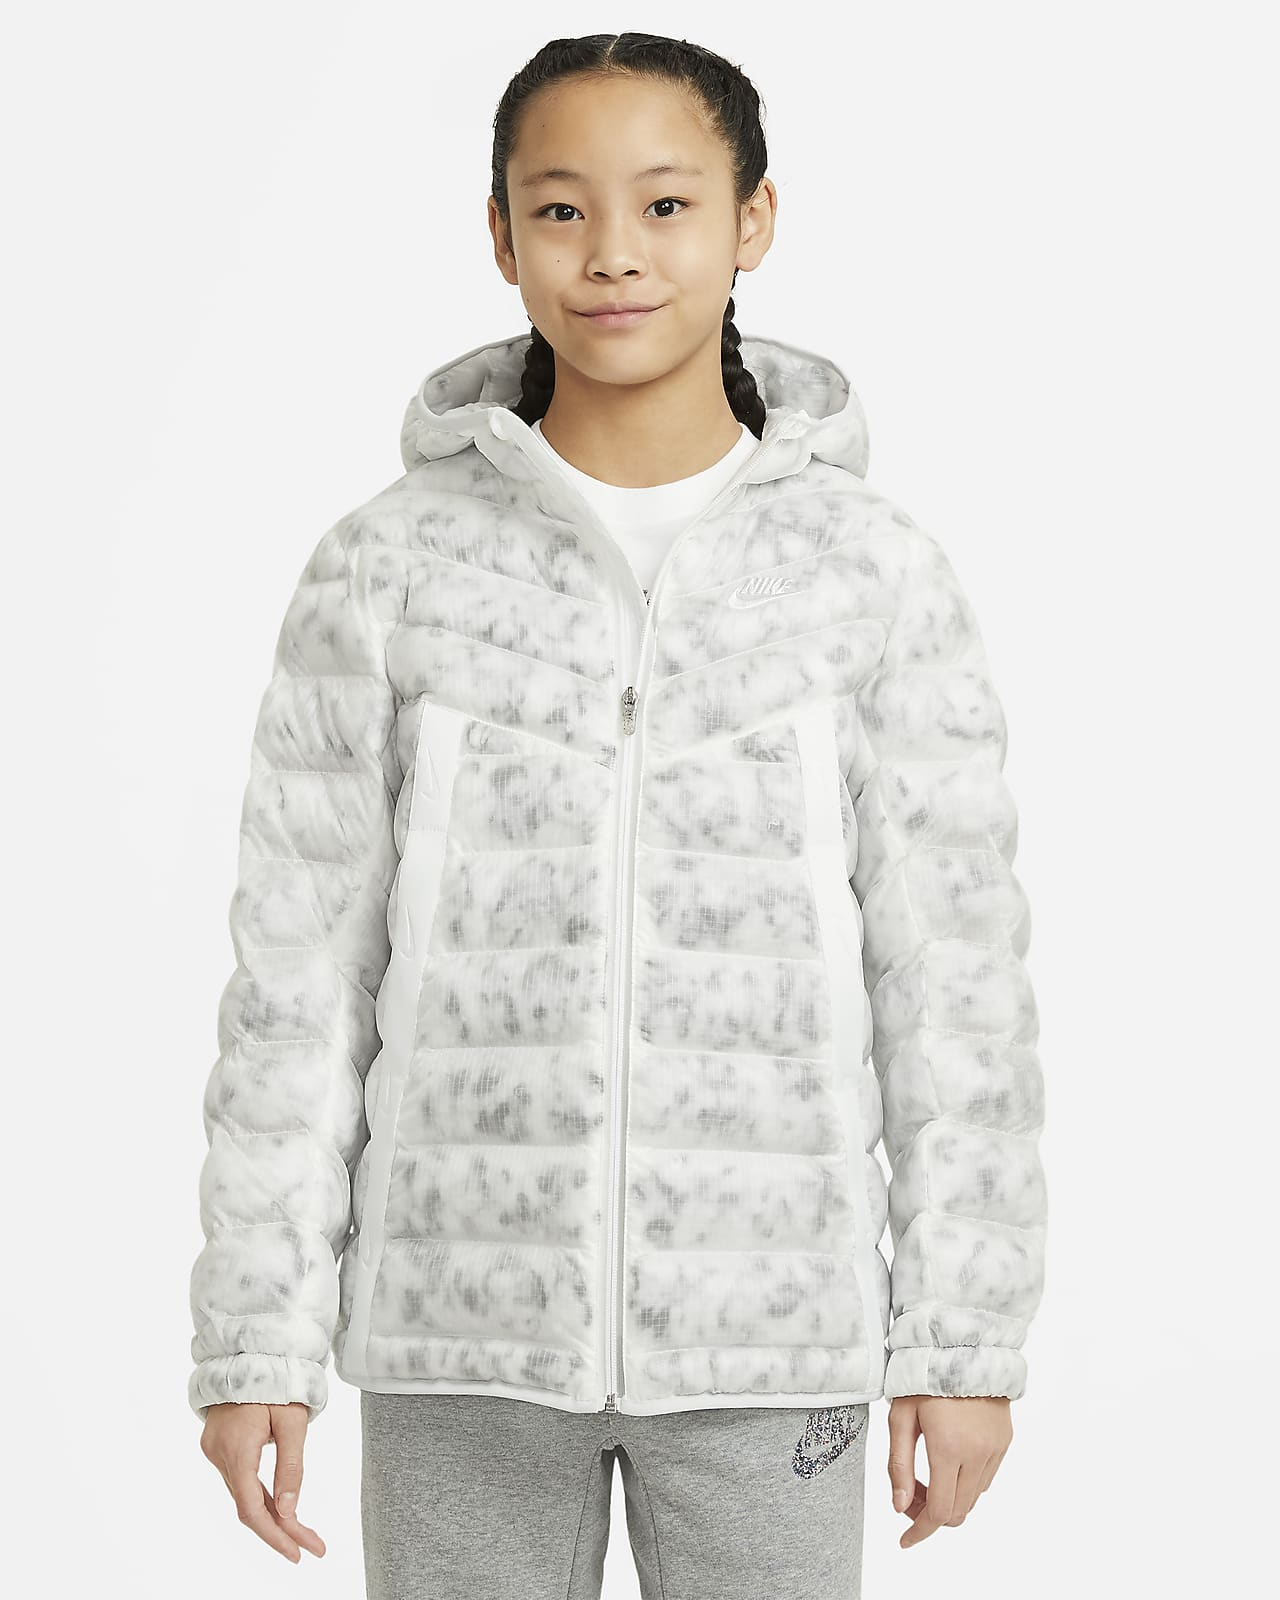 Nike Sportswear Older Kids' Synthetic-Fill Water-Repellent Marble Jacket